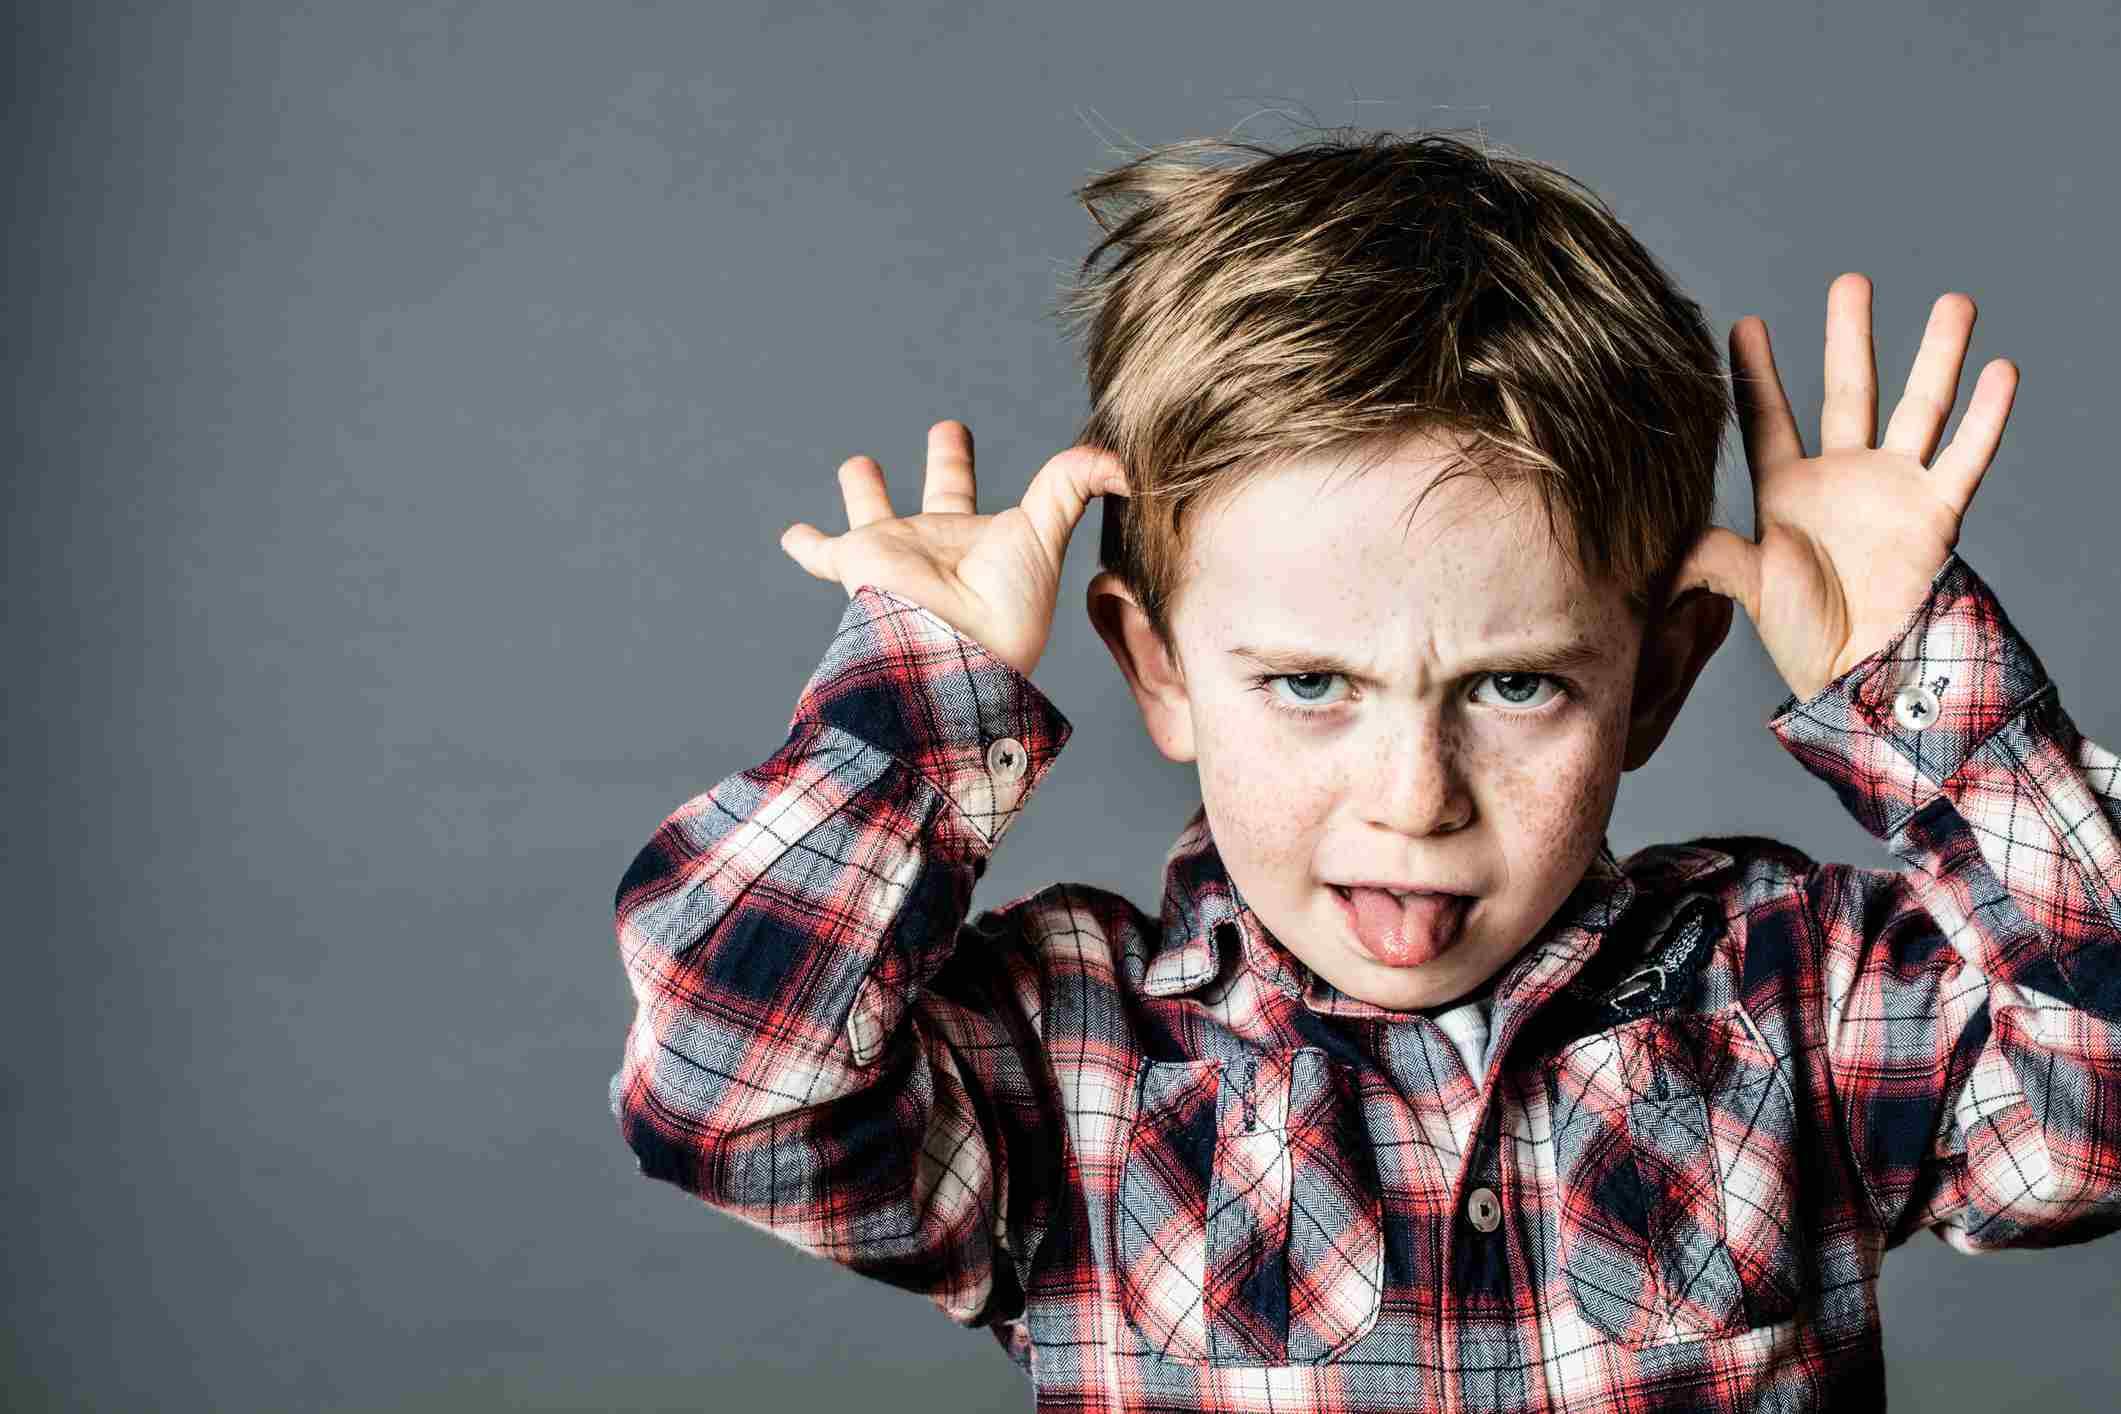 angry little brat enjoying making a grimace for misbehavior